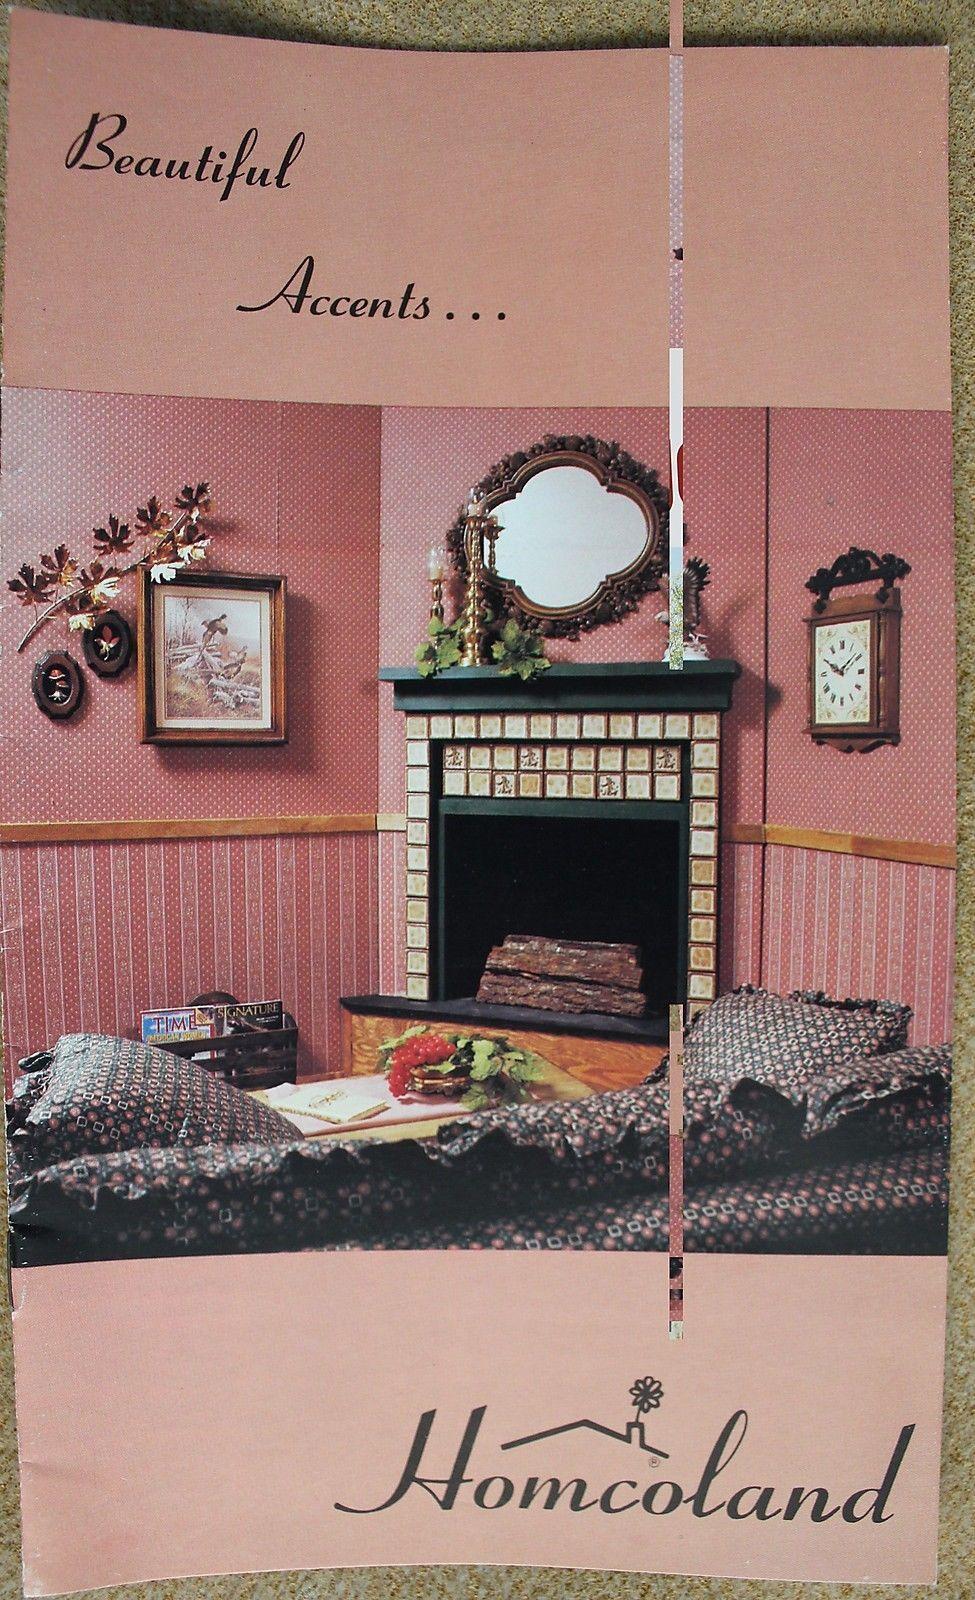 Home Interiors Amp Gifts 1980 039 S Catalog Brochure 9951 Vol 18 No 5 Ebay Home Interiors And Gifts House Interior Interior